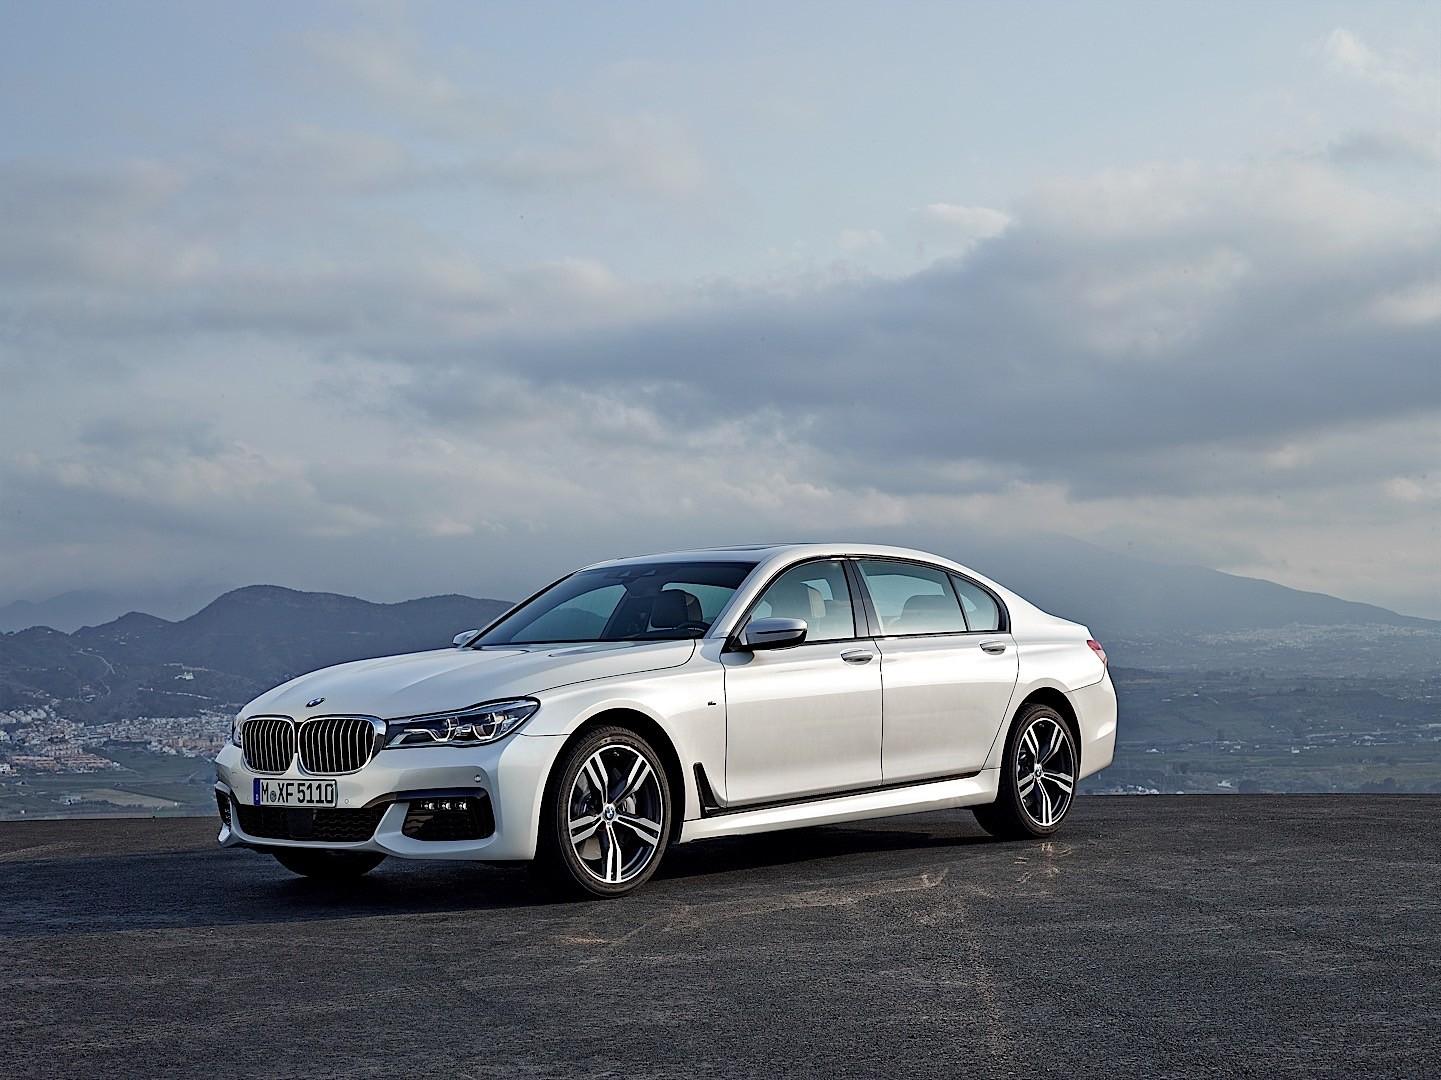 BMW 7 Series (G11/G12) - 2016 - autoevolution